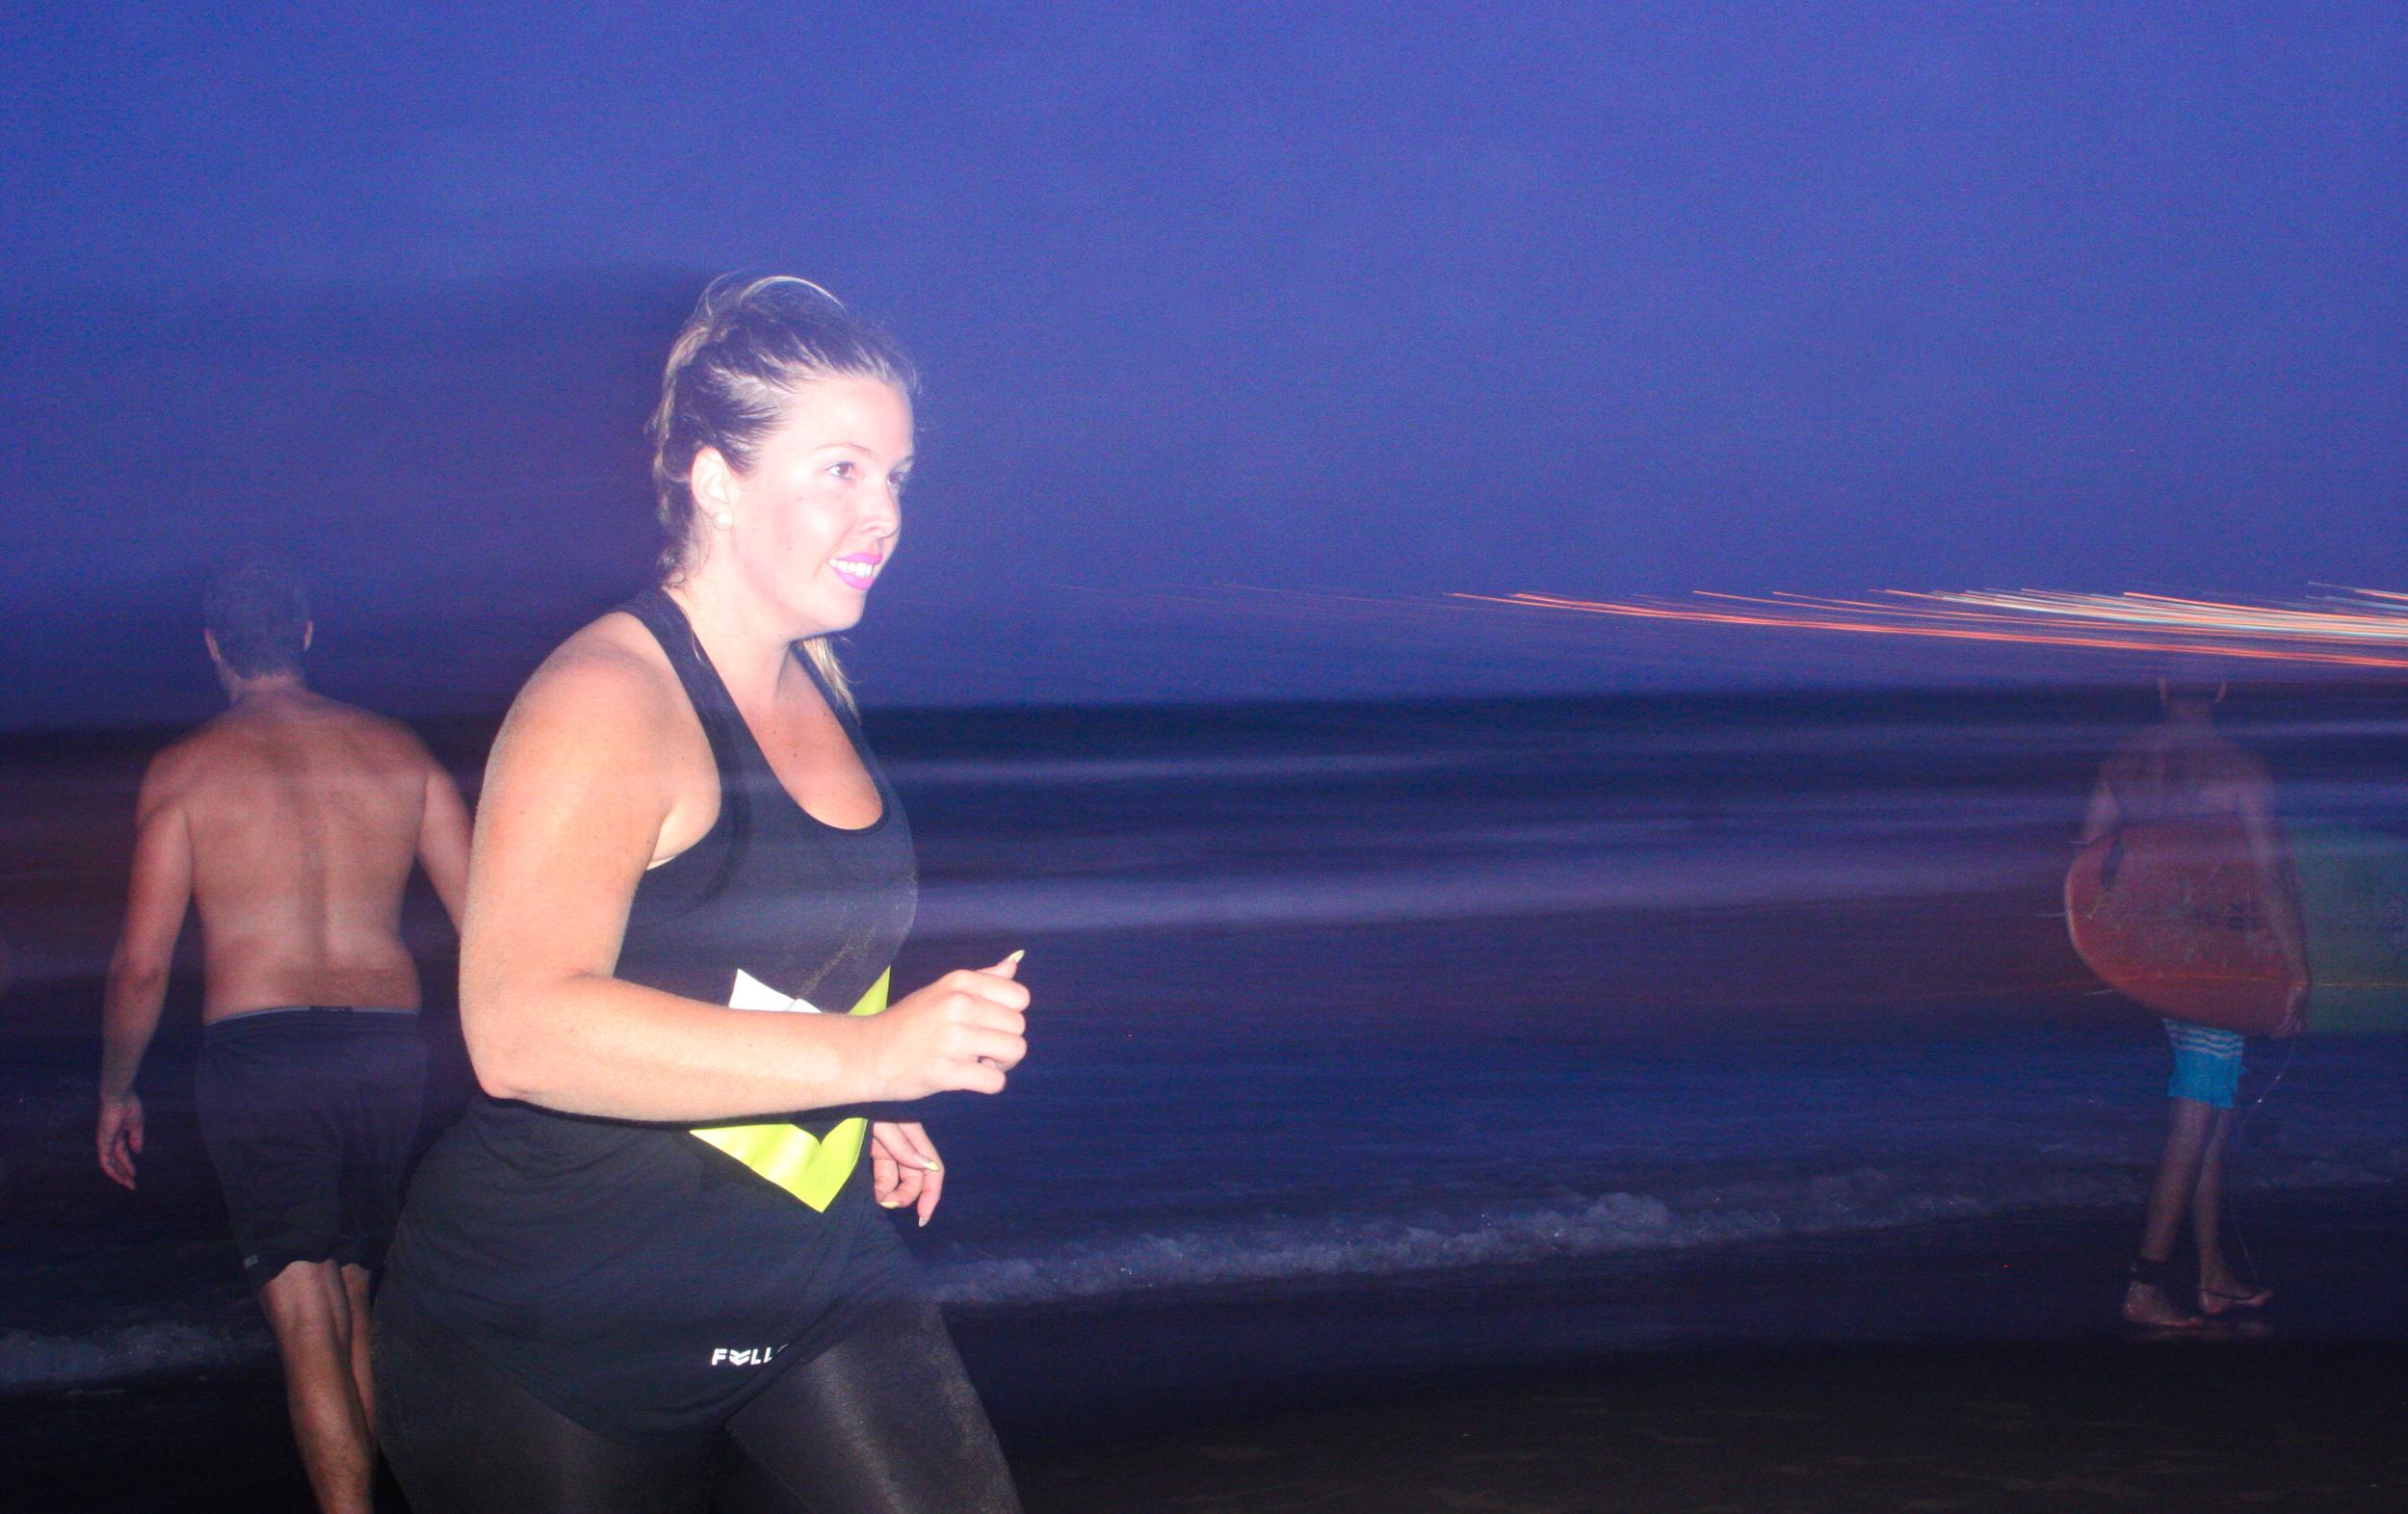 Full_CrossFit_Beach_Wod_V2_2015-20.jpg